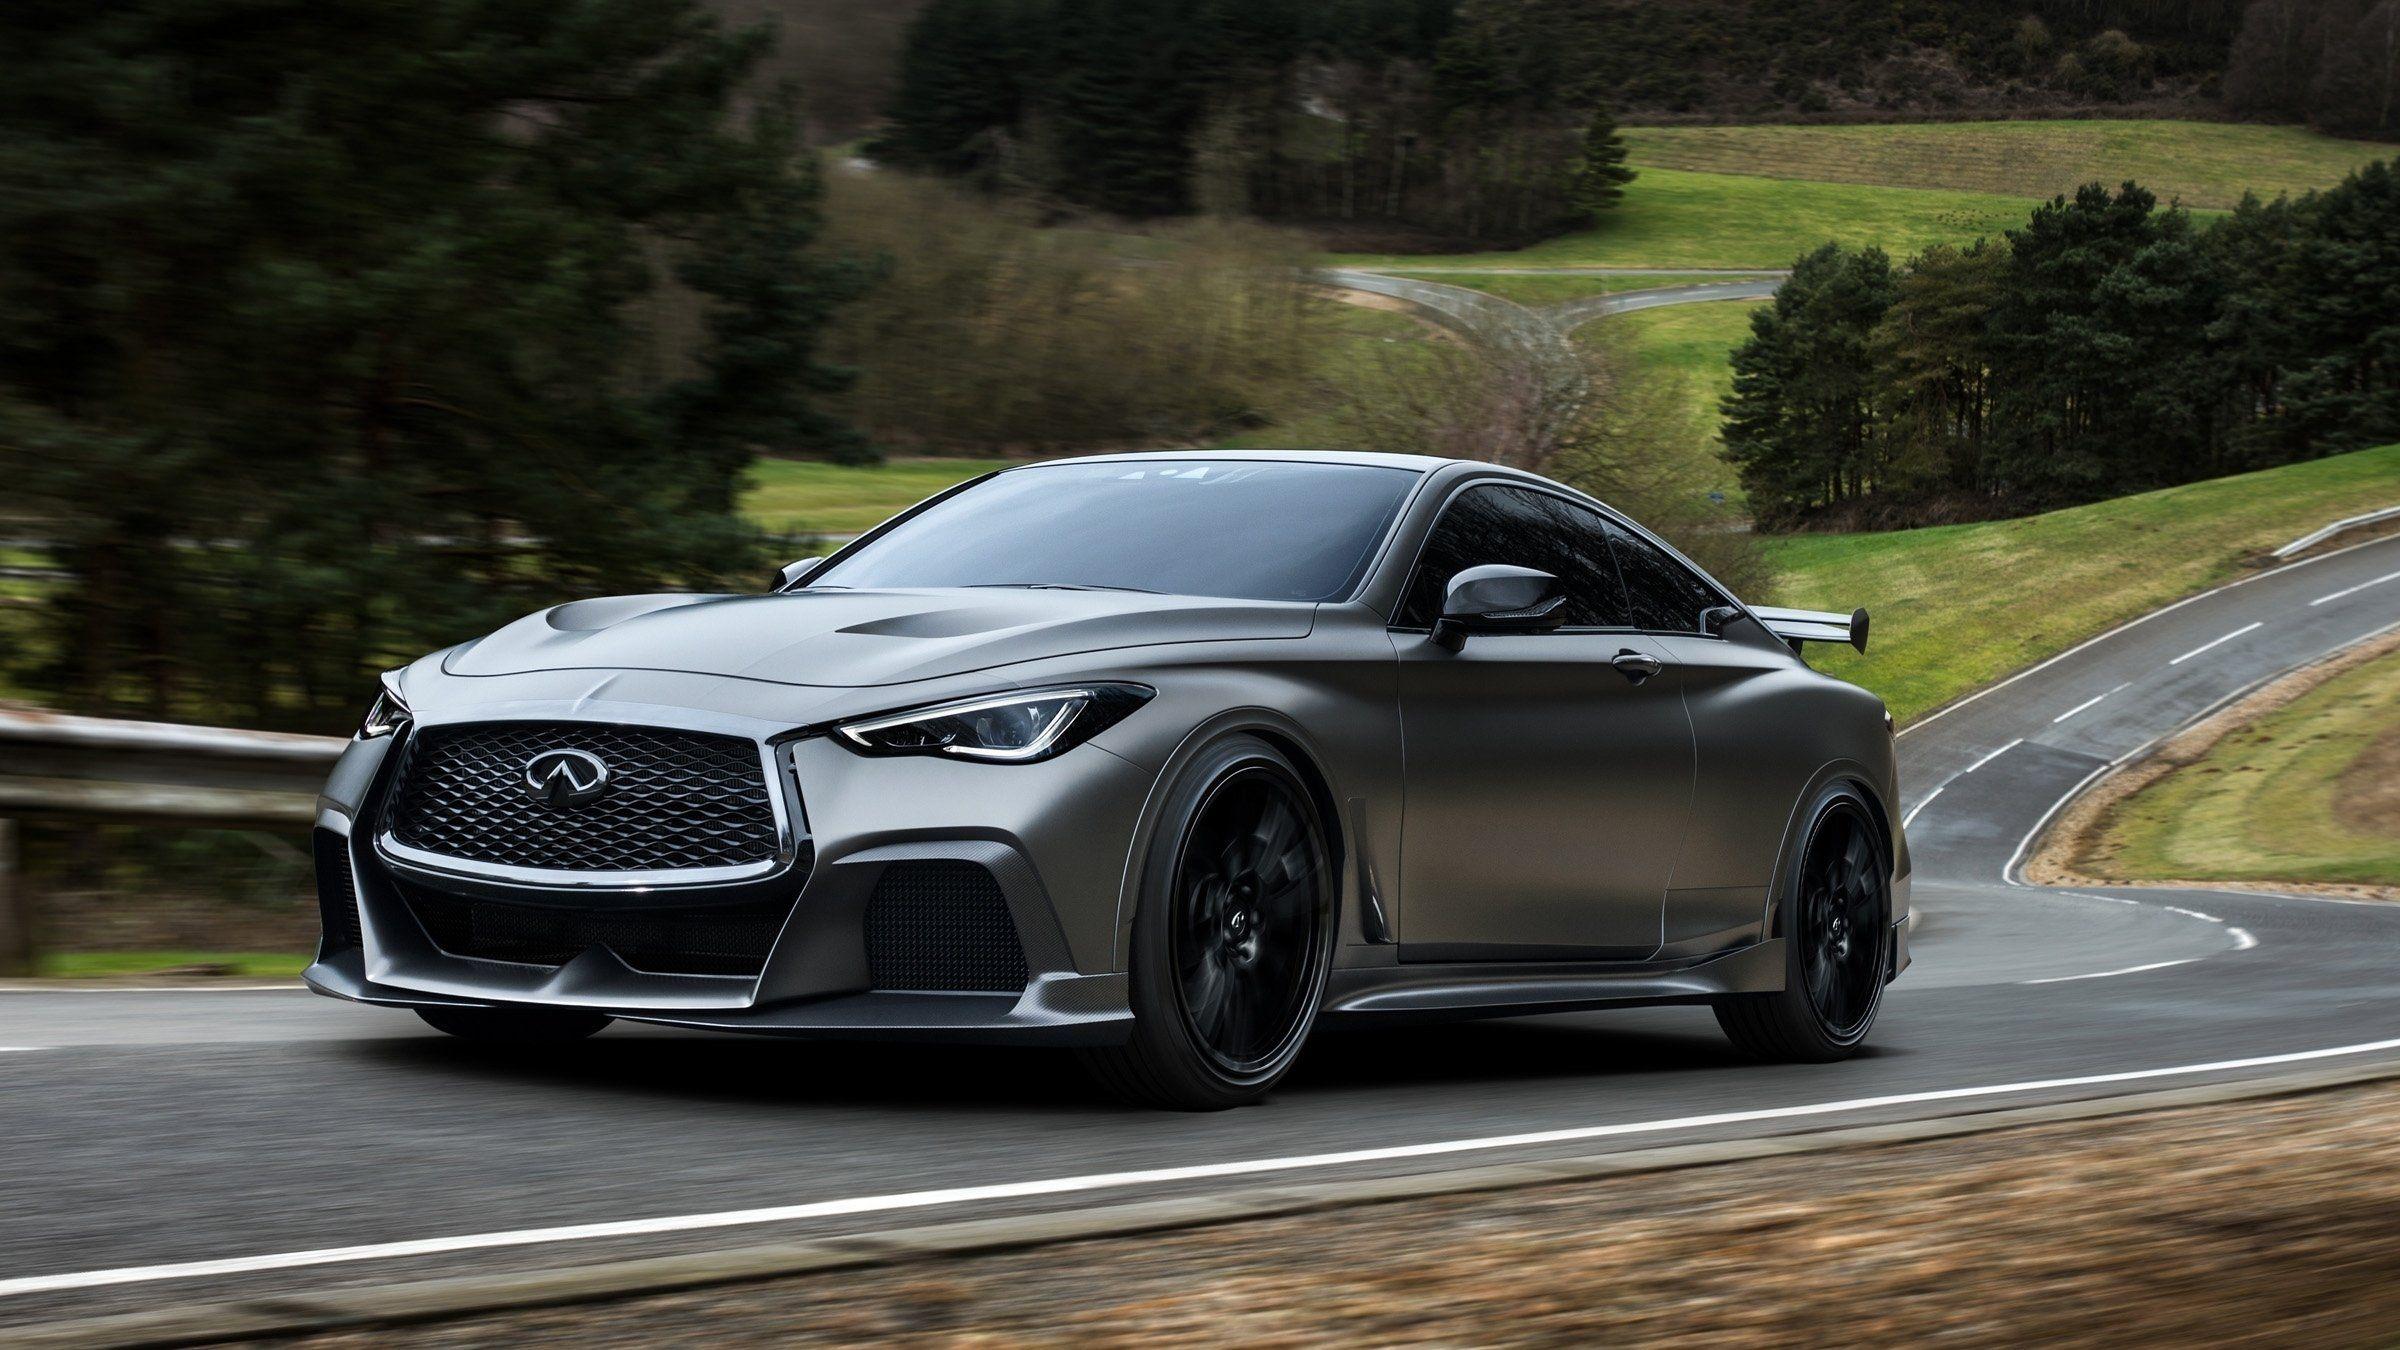 Car Industry Latest News Updates Autodeals Pk In 2020 Infiniti Infiniti G37 Infiniti Q50